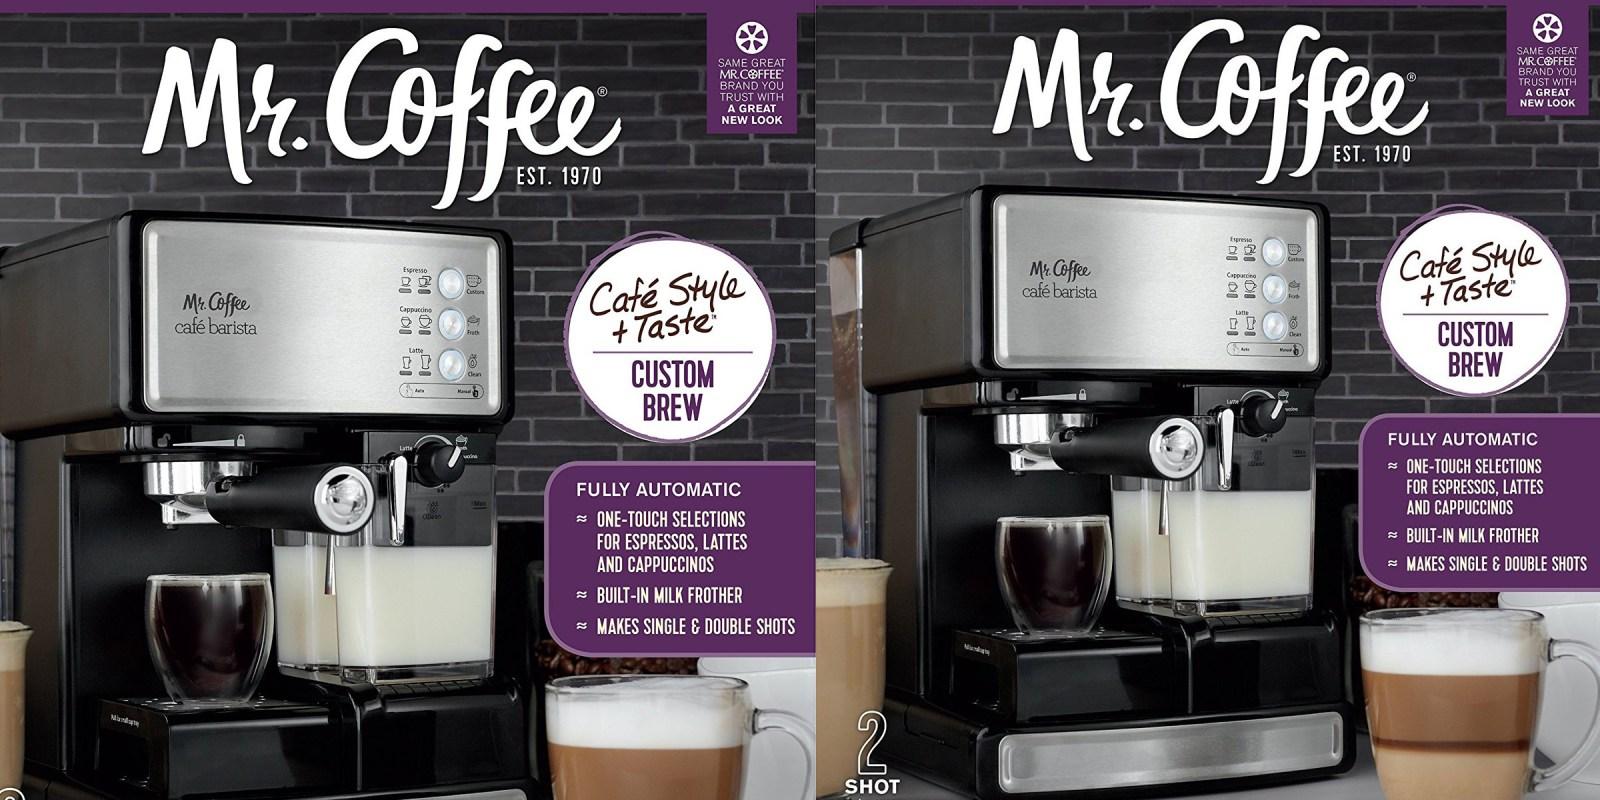 Mr. Coffee Automatic Espresso Machine for just $119.50 shipped (Reg. $160+)